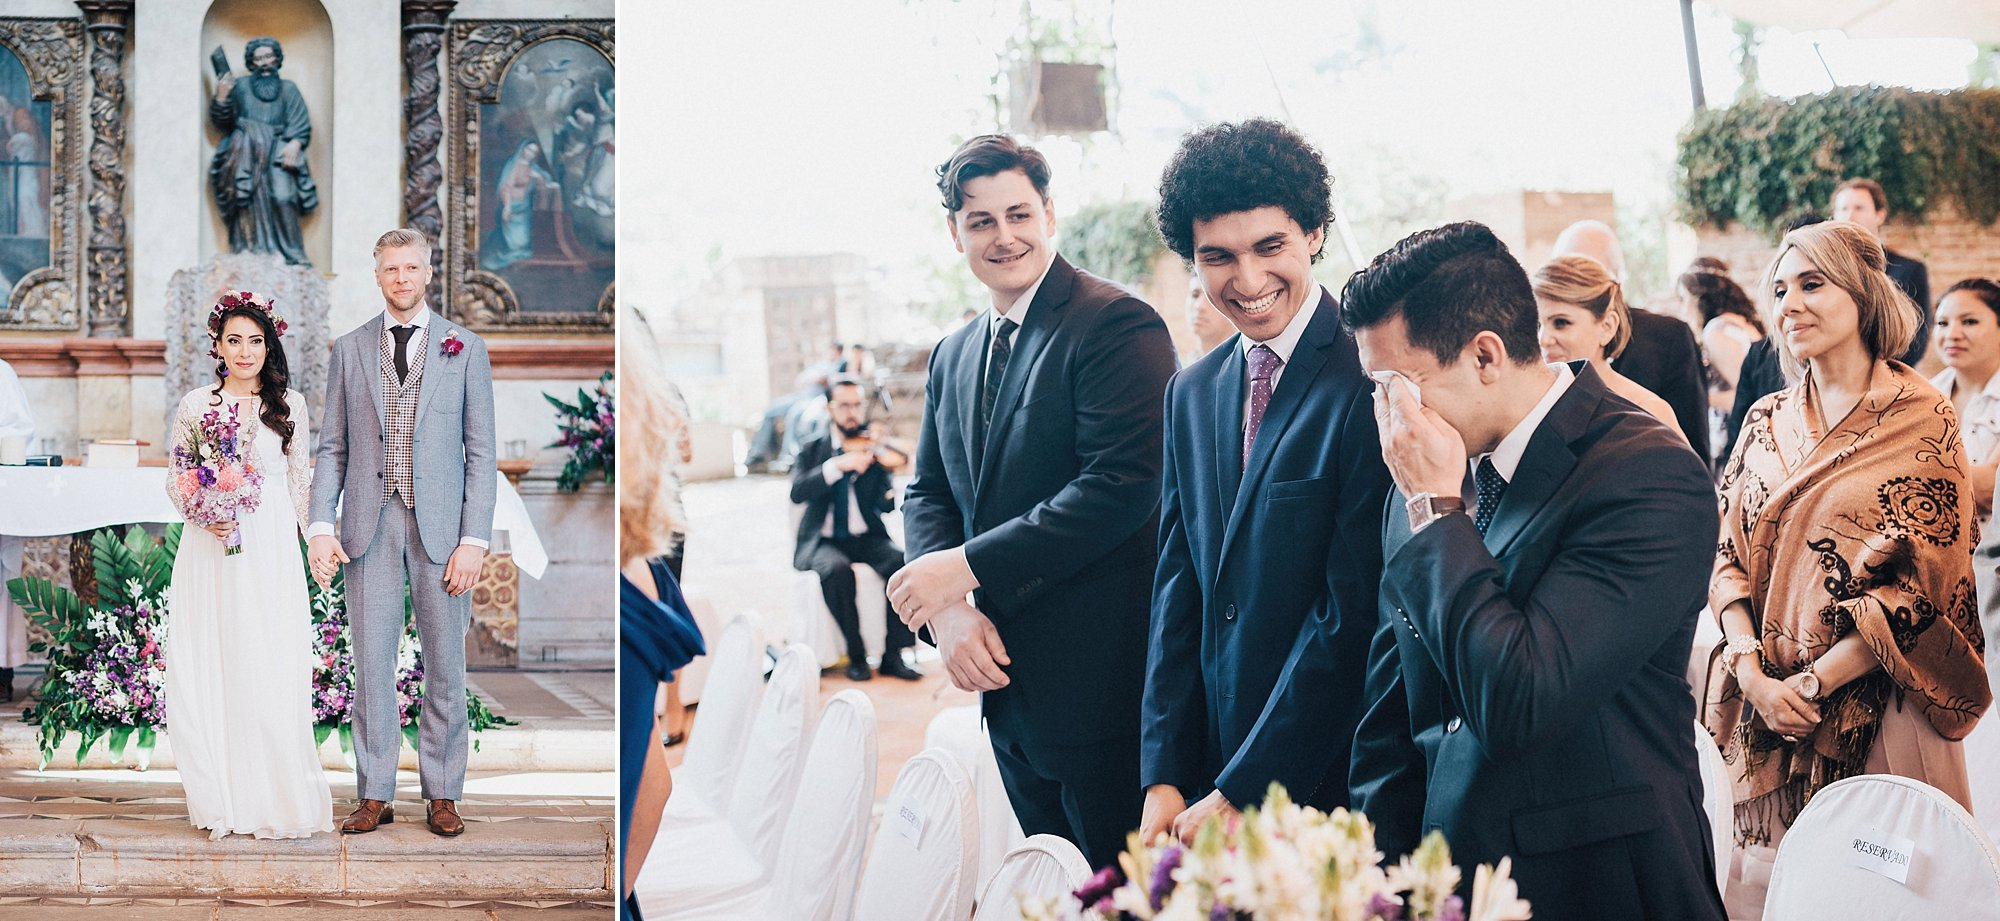 alex-yazmin-wedding-photographer-antigua-guatemala-086